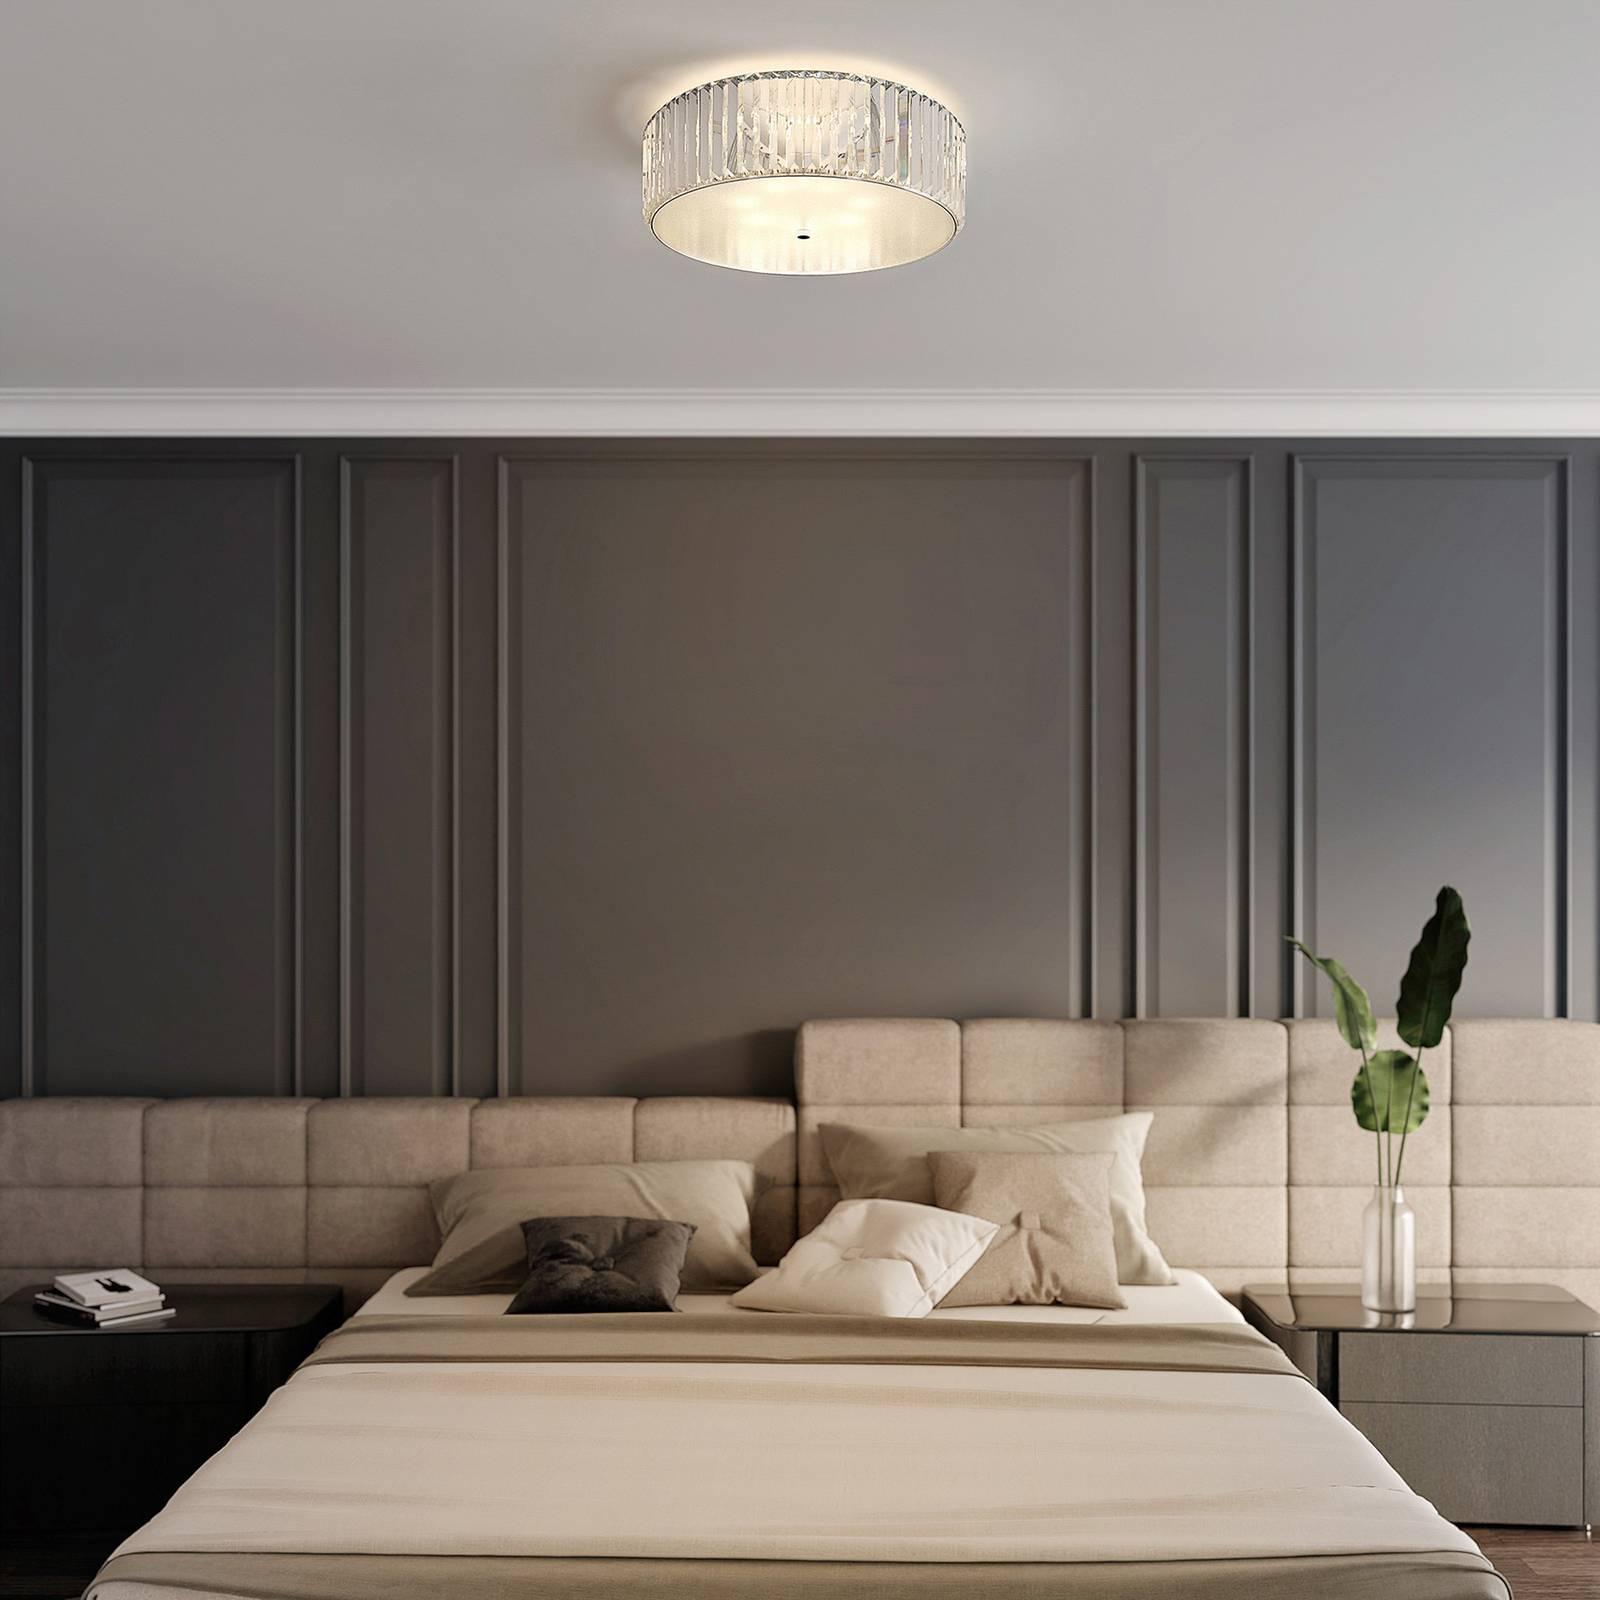 Lucande Alobani -LED-kattovalaisin, kristalli